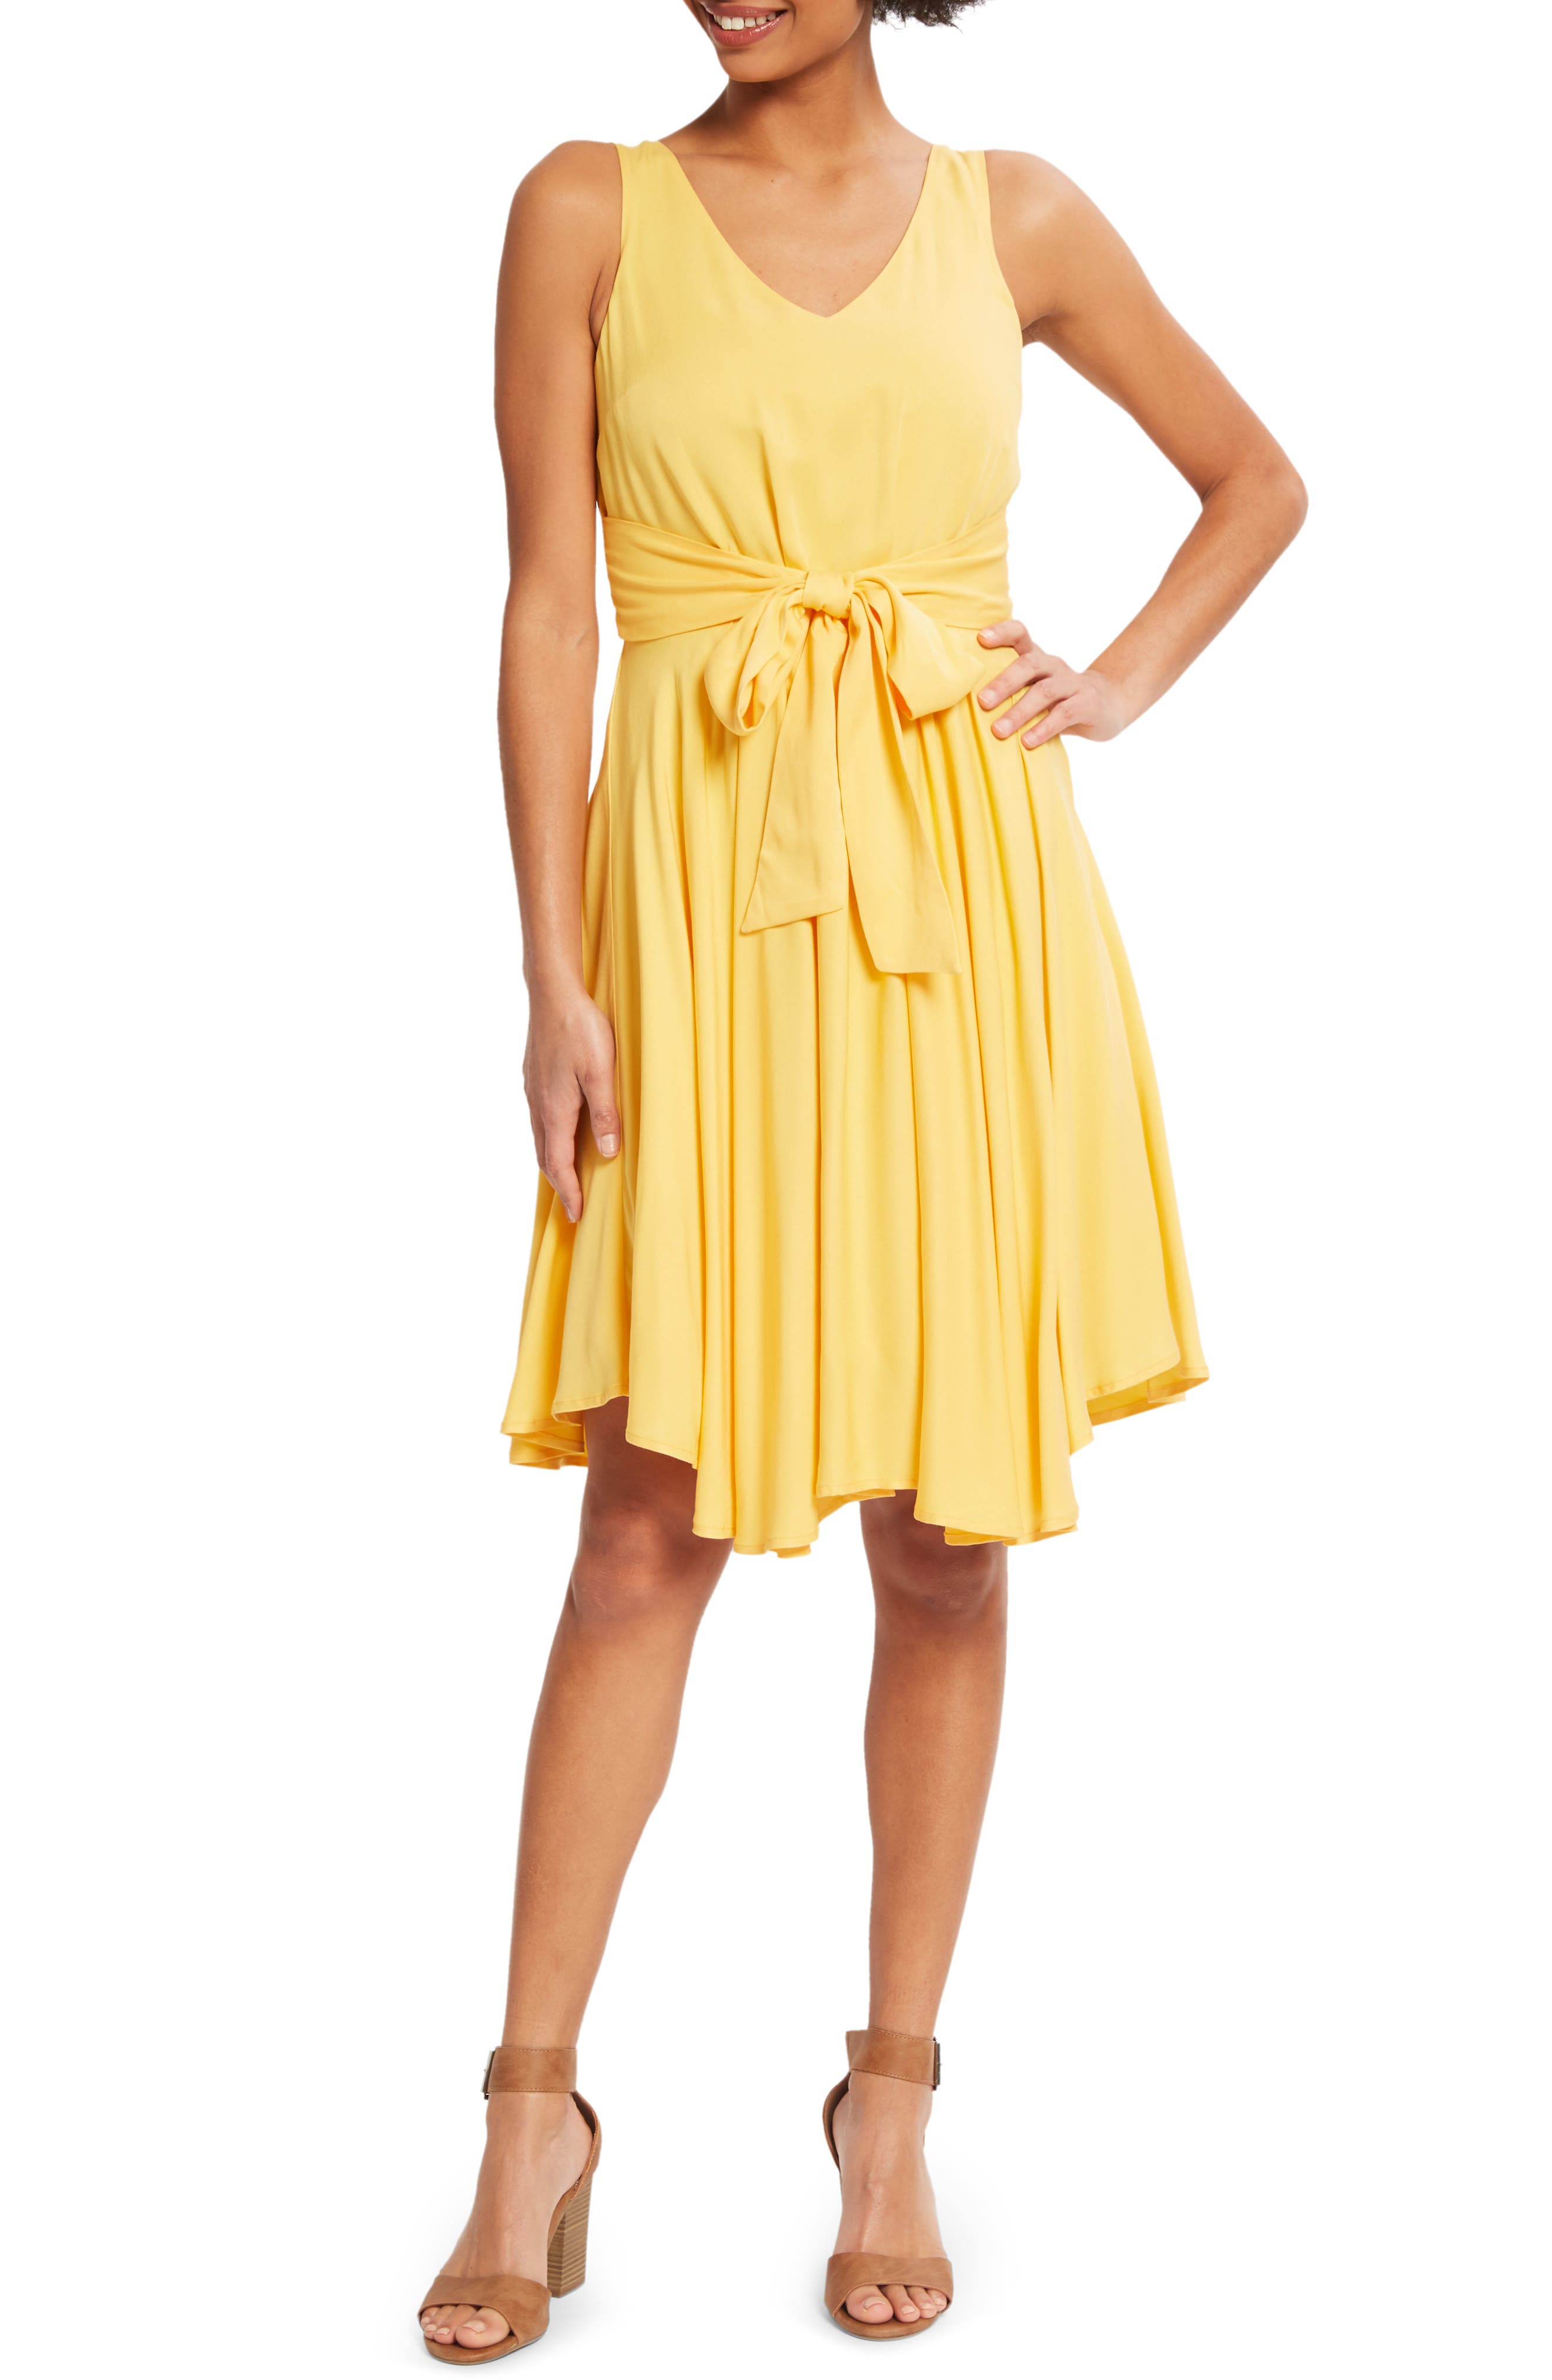 Modcloth Sleeveless Pleated Tank Dress, Yellow